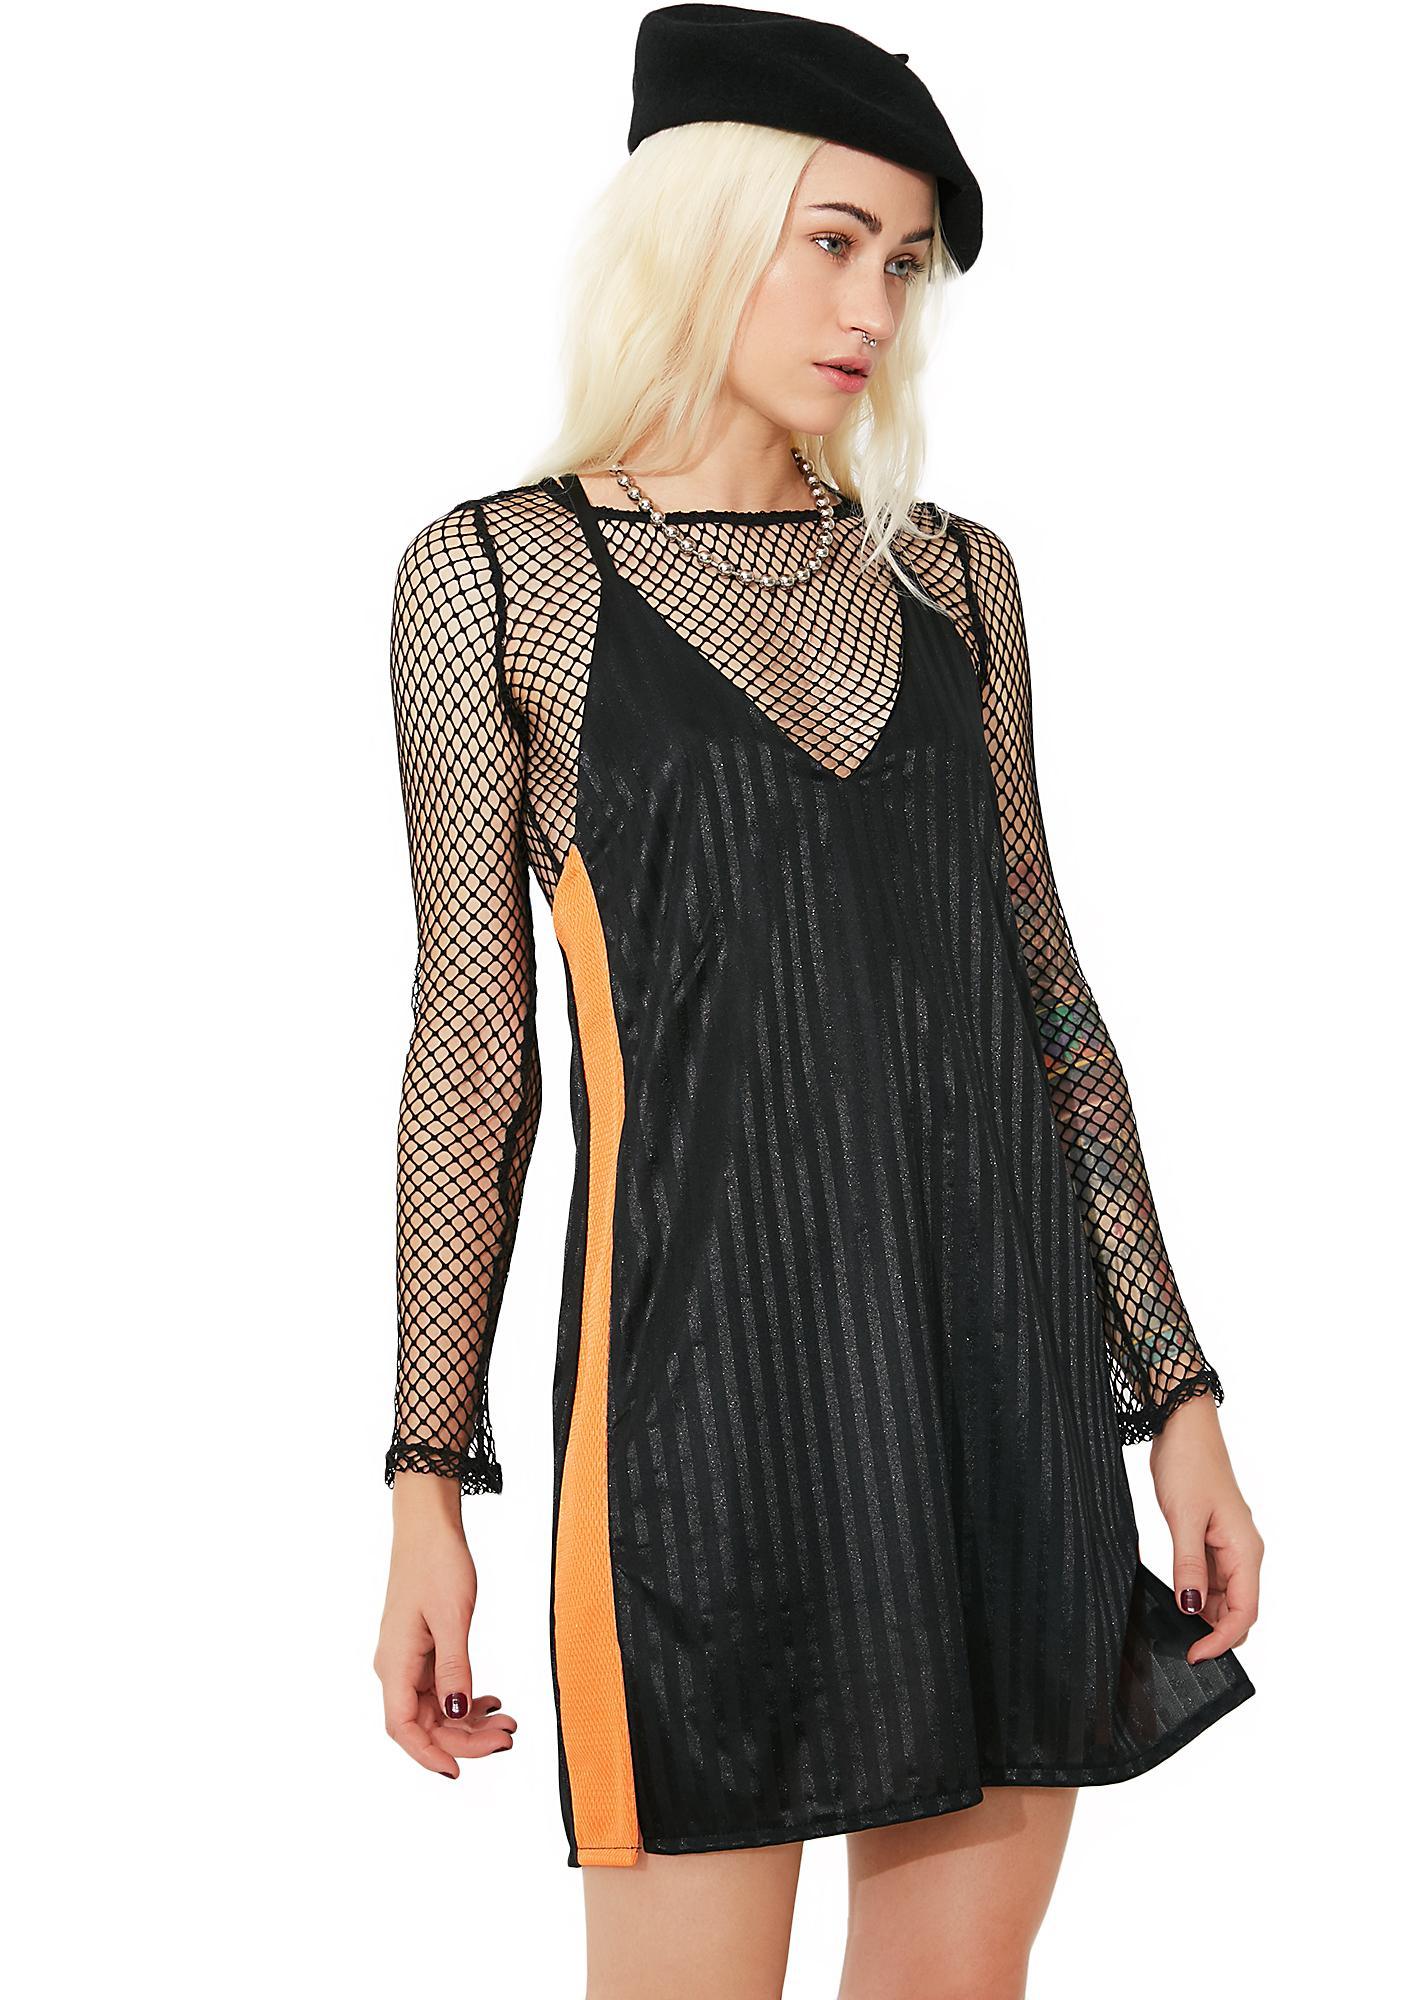 The Ragged Priest District Dress